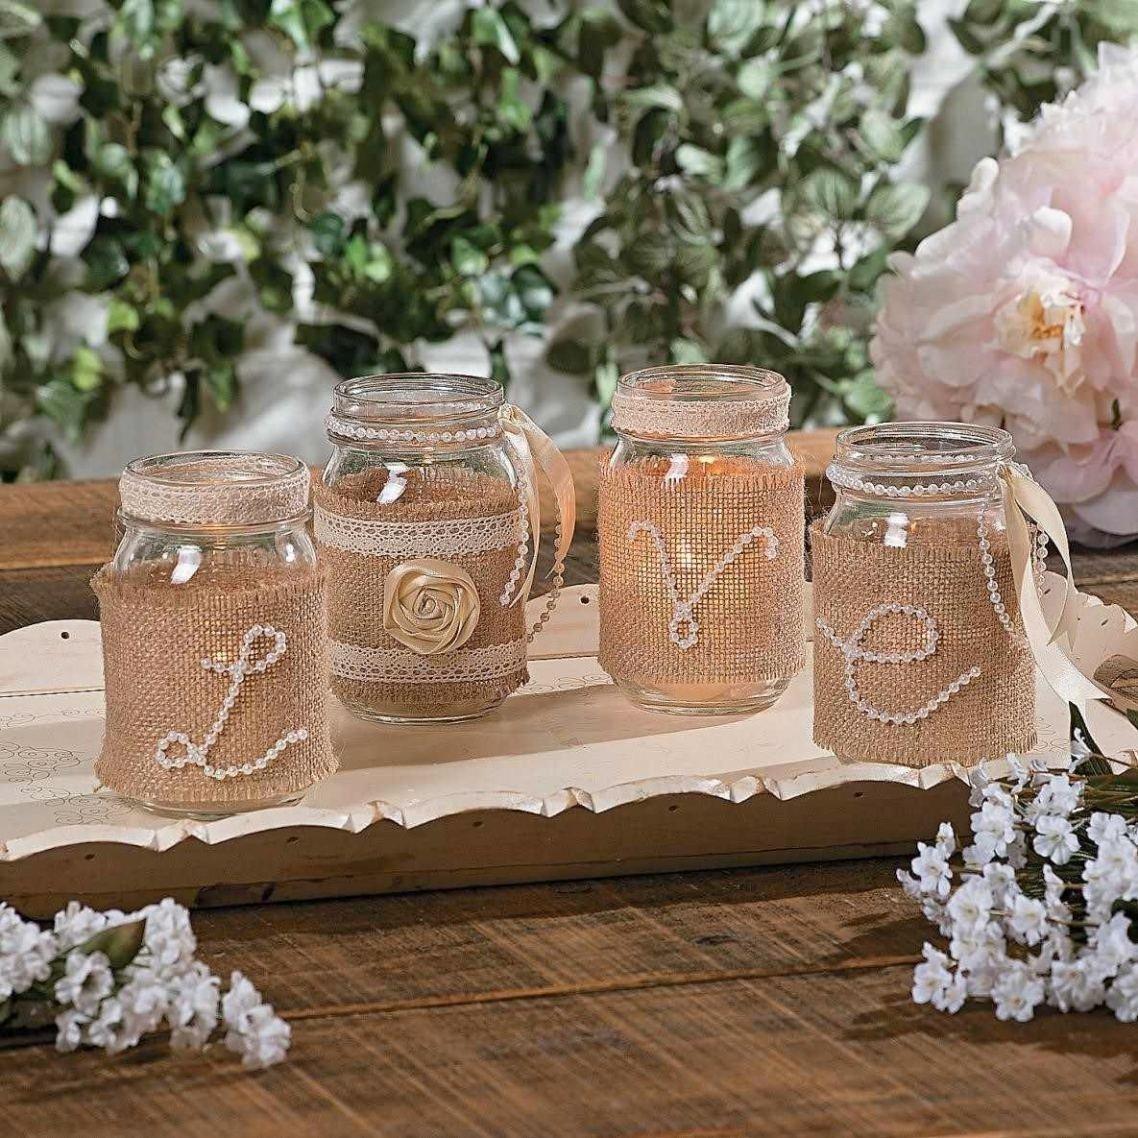 10 Ideal Mason Jar Wedding Centerpieces Ideas party mason rustic wedding ideas mason jars jar wedding centerpieces 1 2020